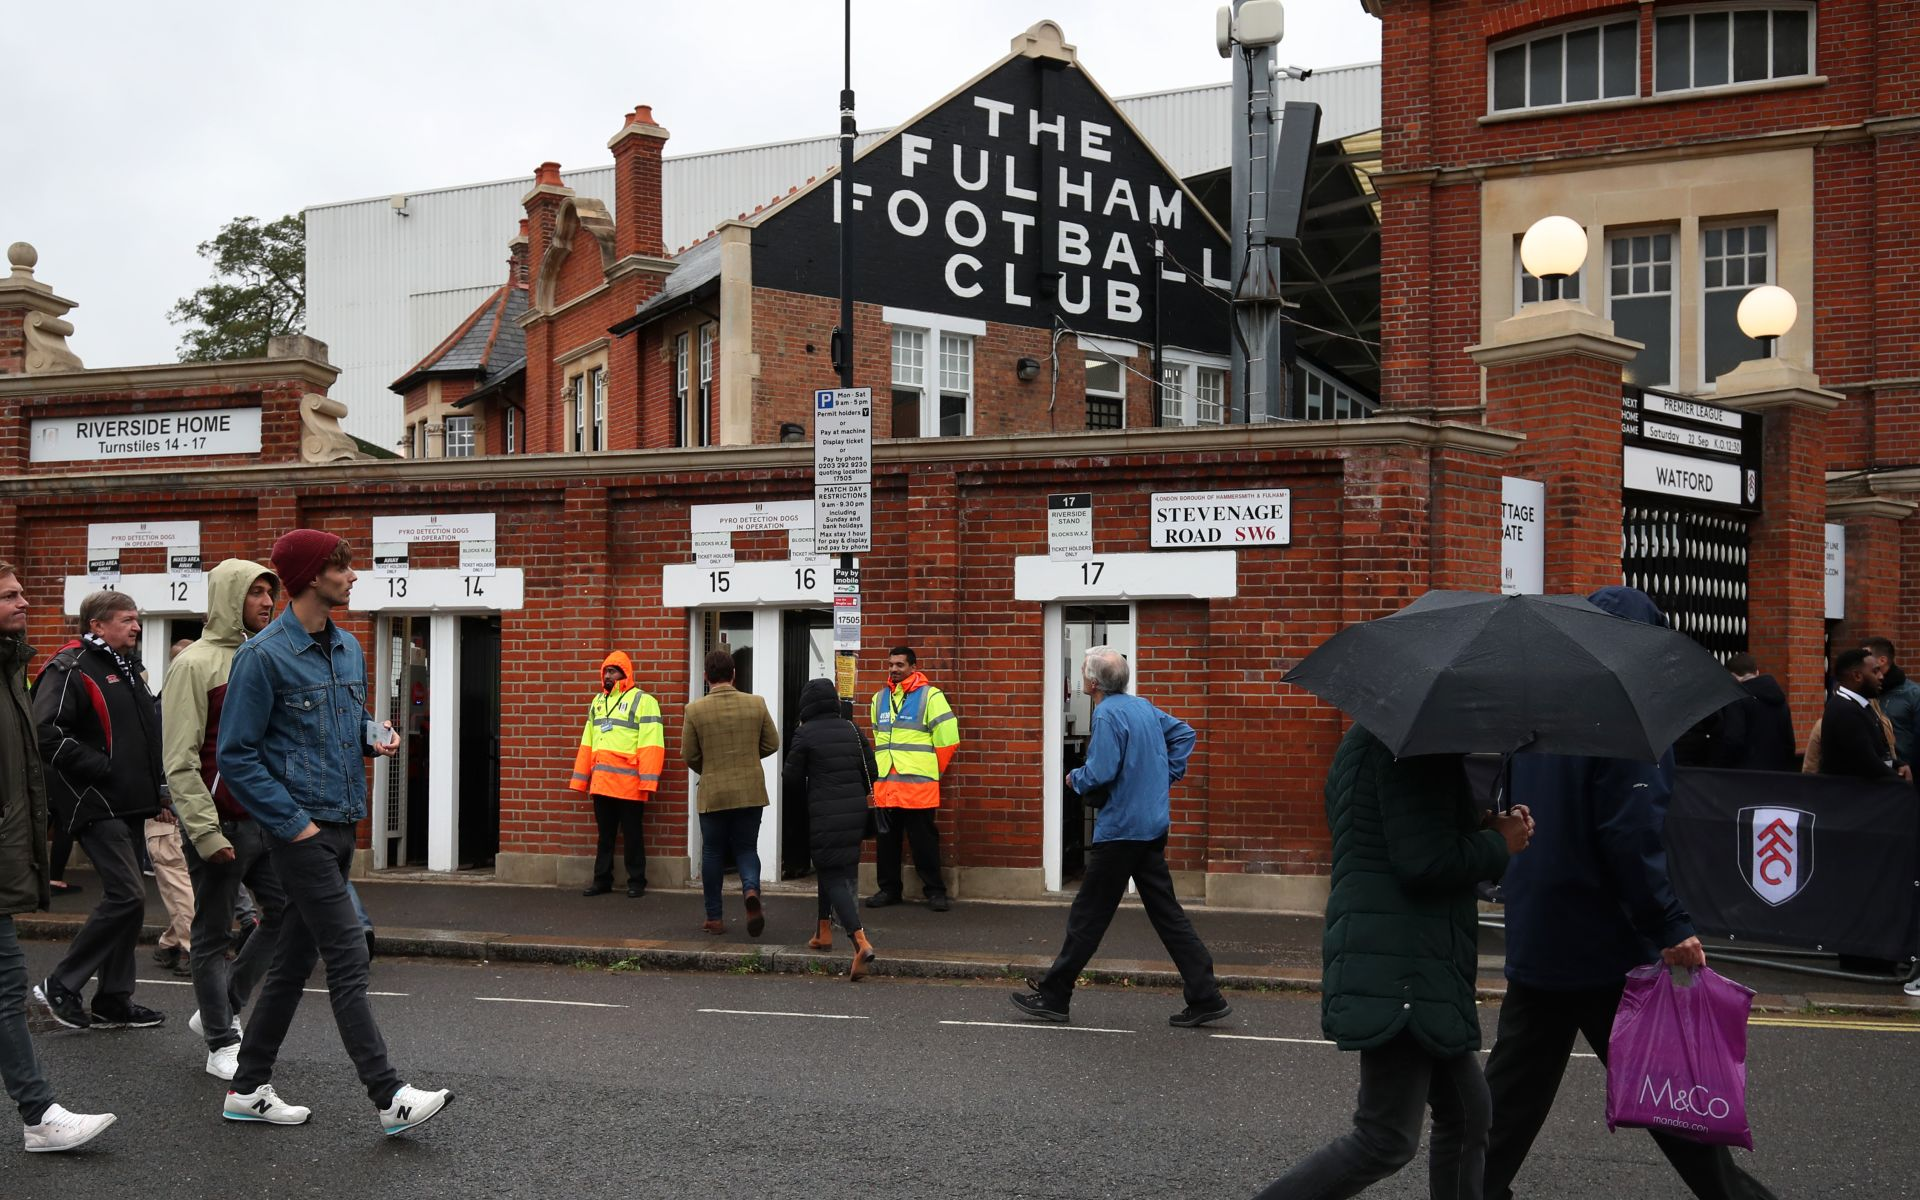 Fulham vs Manchester United betting first goalscorer odds